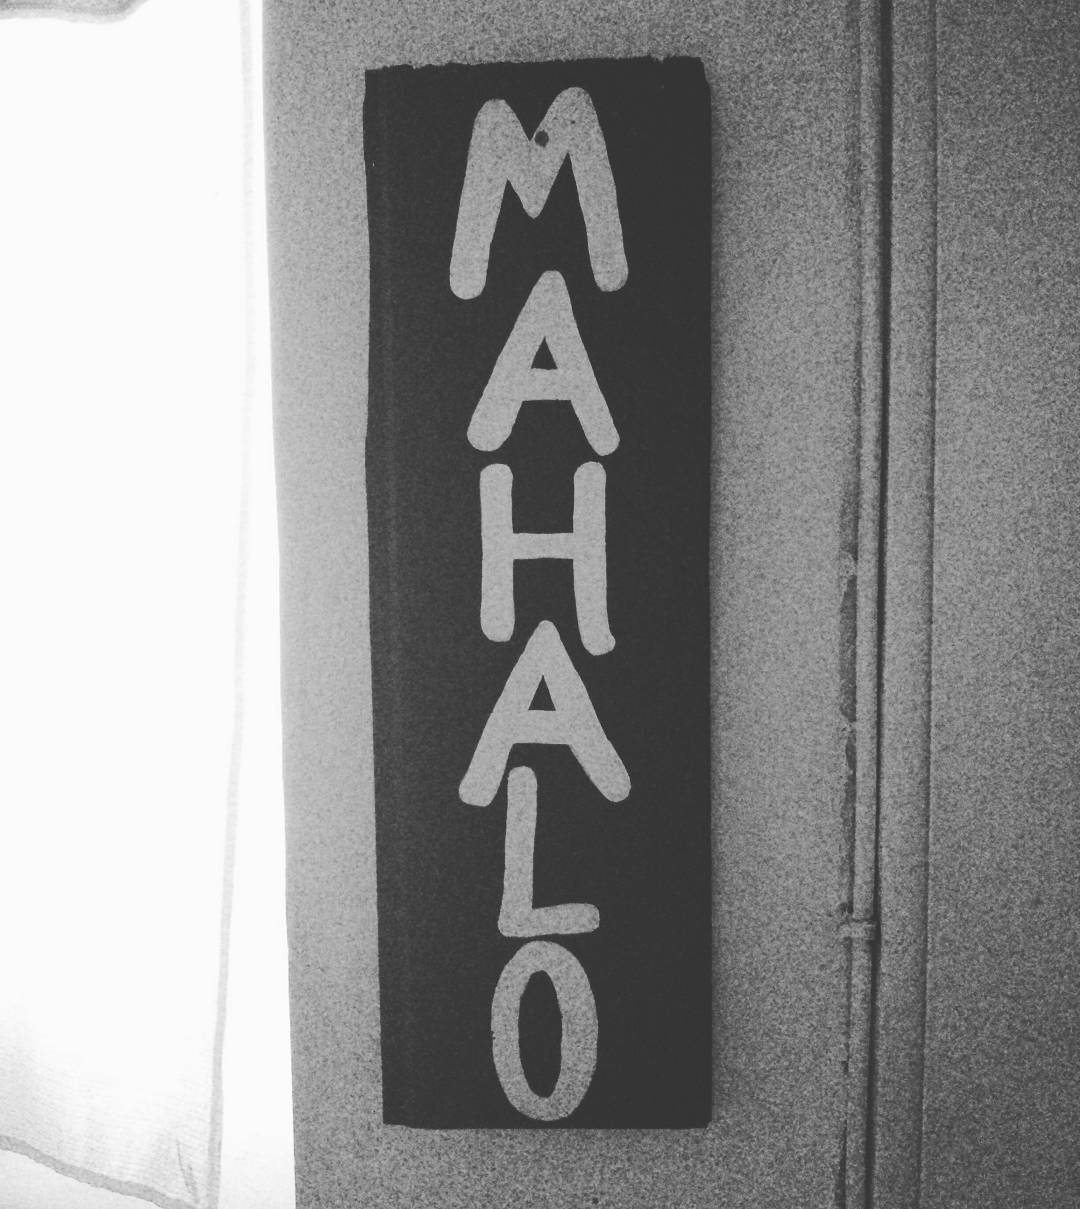 Si andas x Beccar, te esperamos en nuestro Showroom. Maestro Santana 2174. Estamos hasta las 20hs. Mahalo. #maetuanis #followthesun #showroom #beccar #mahalo